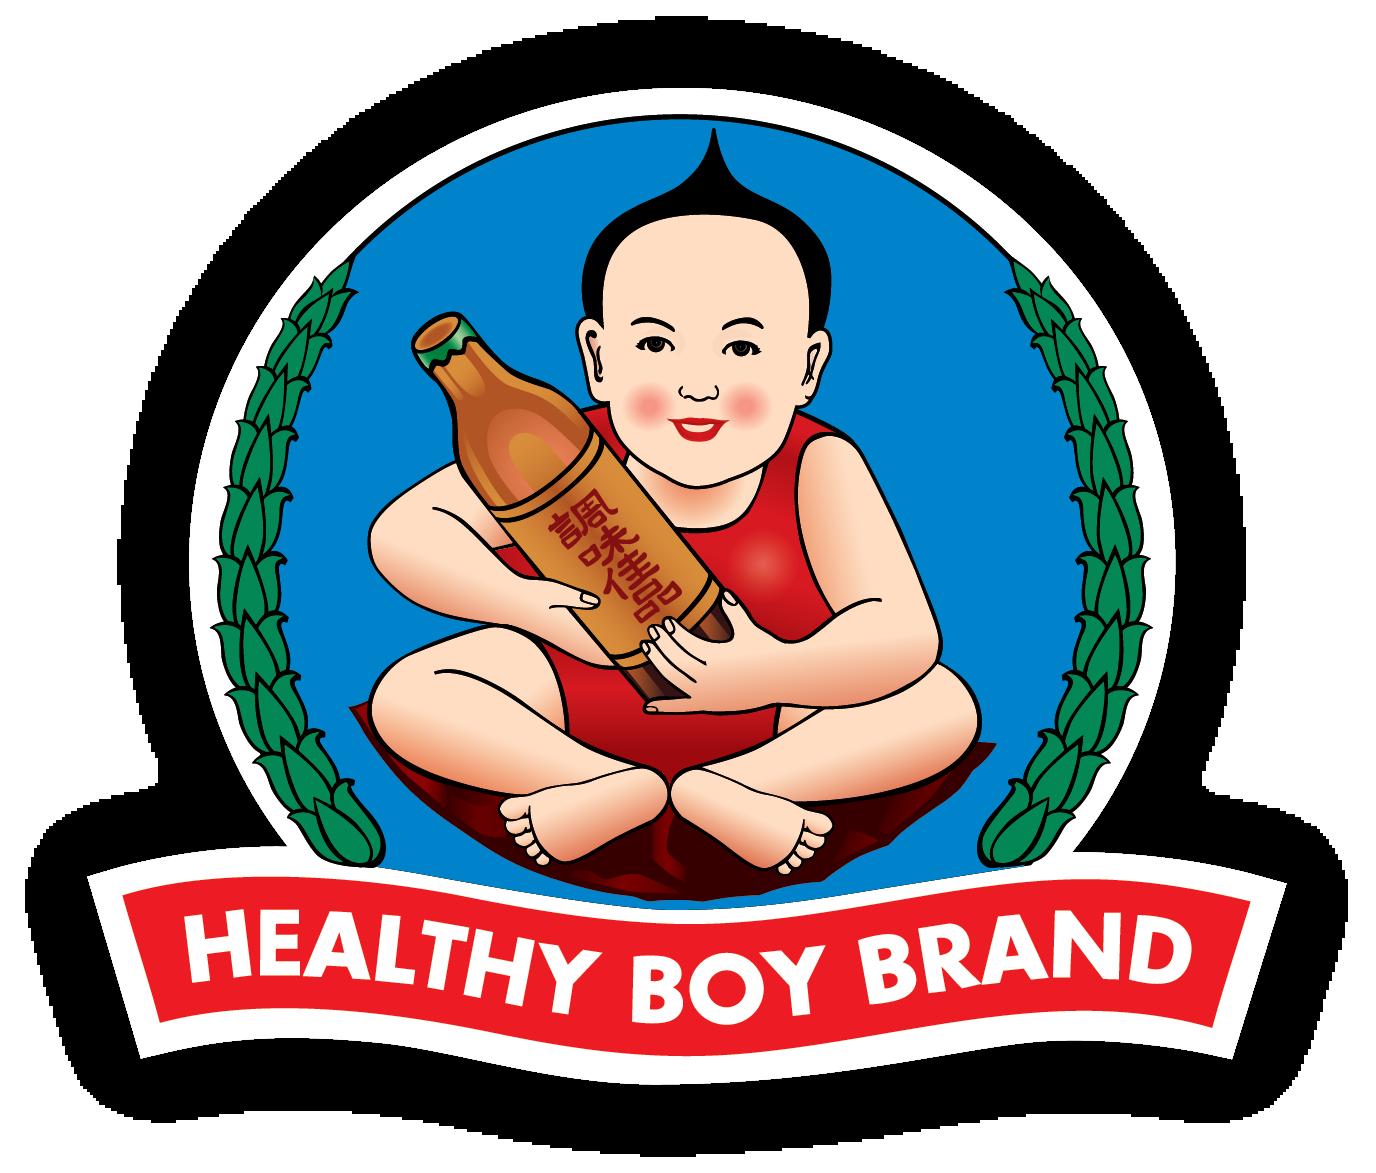 HealthyBoy